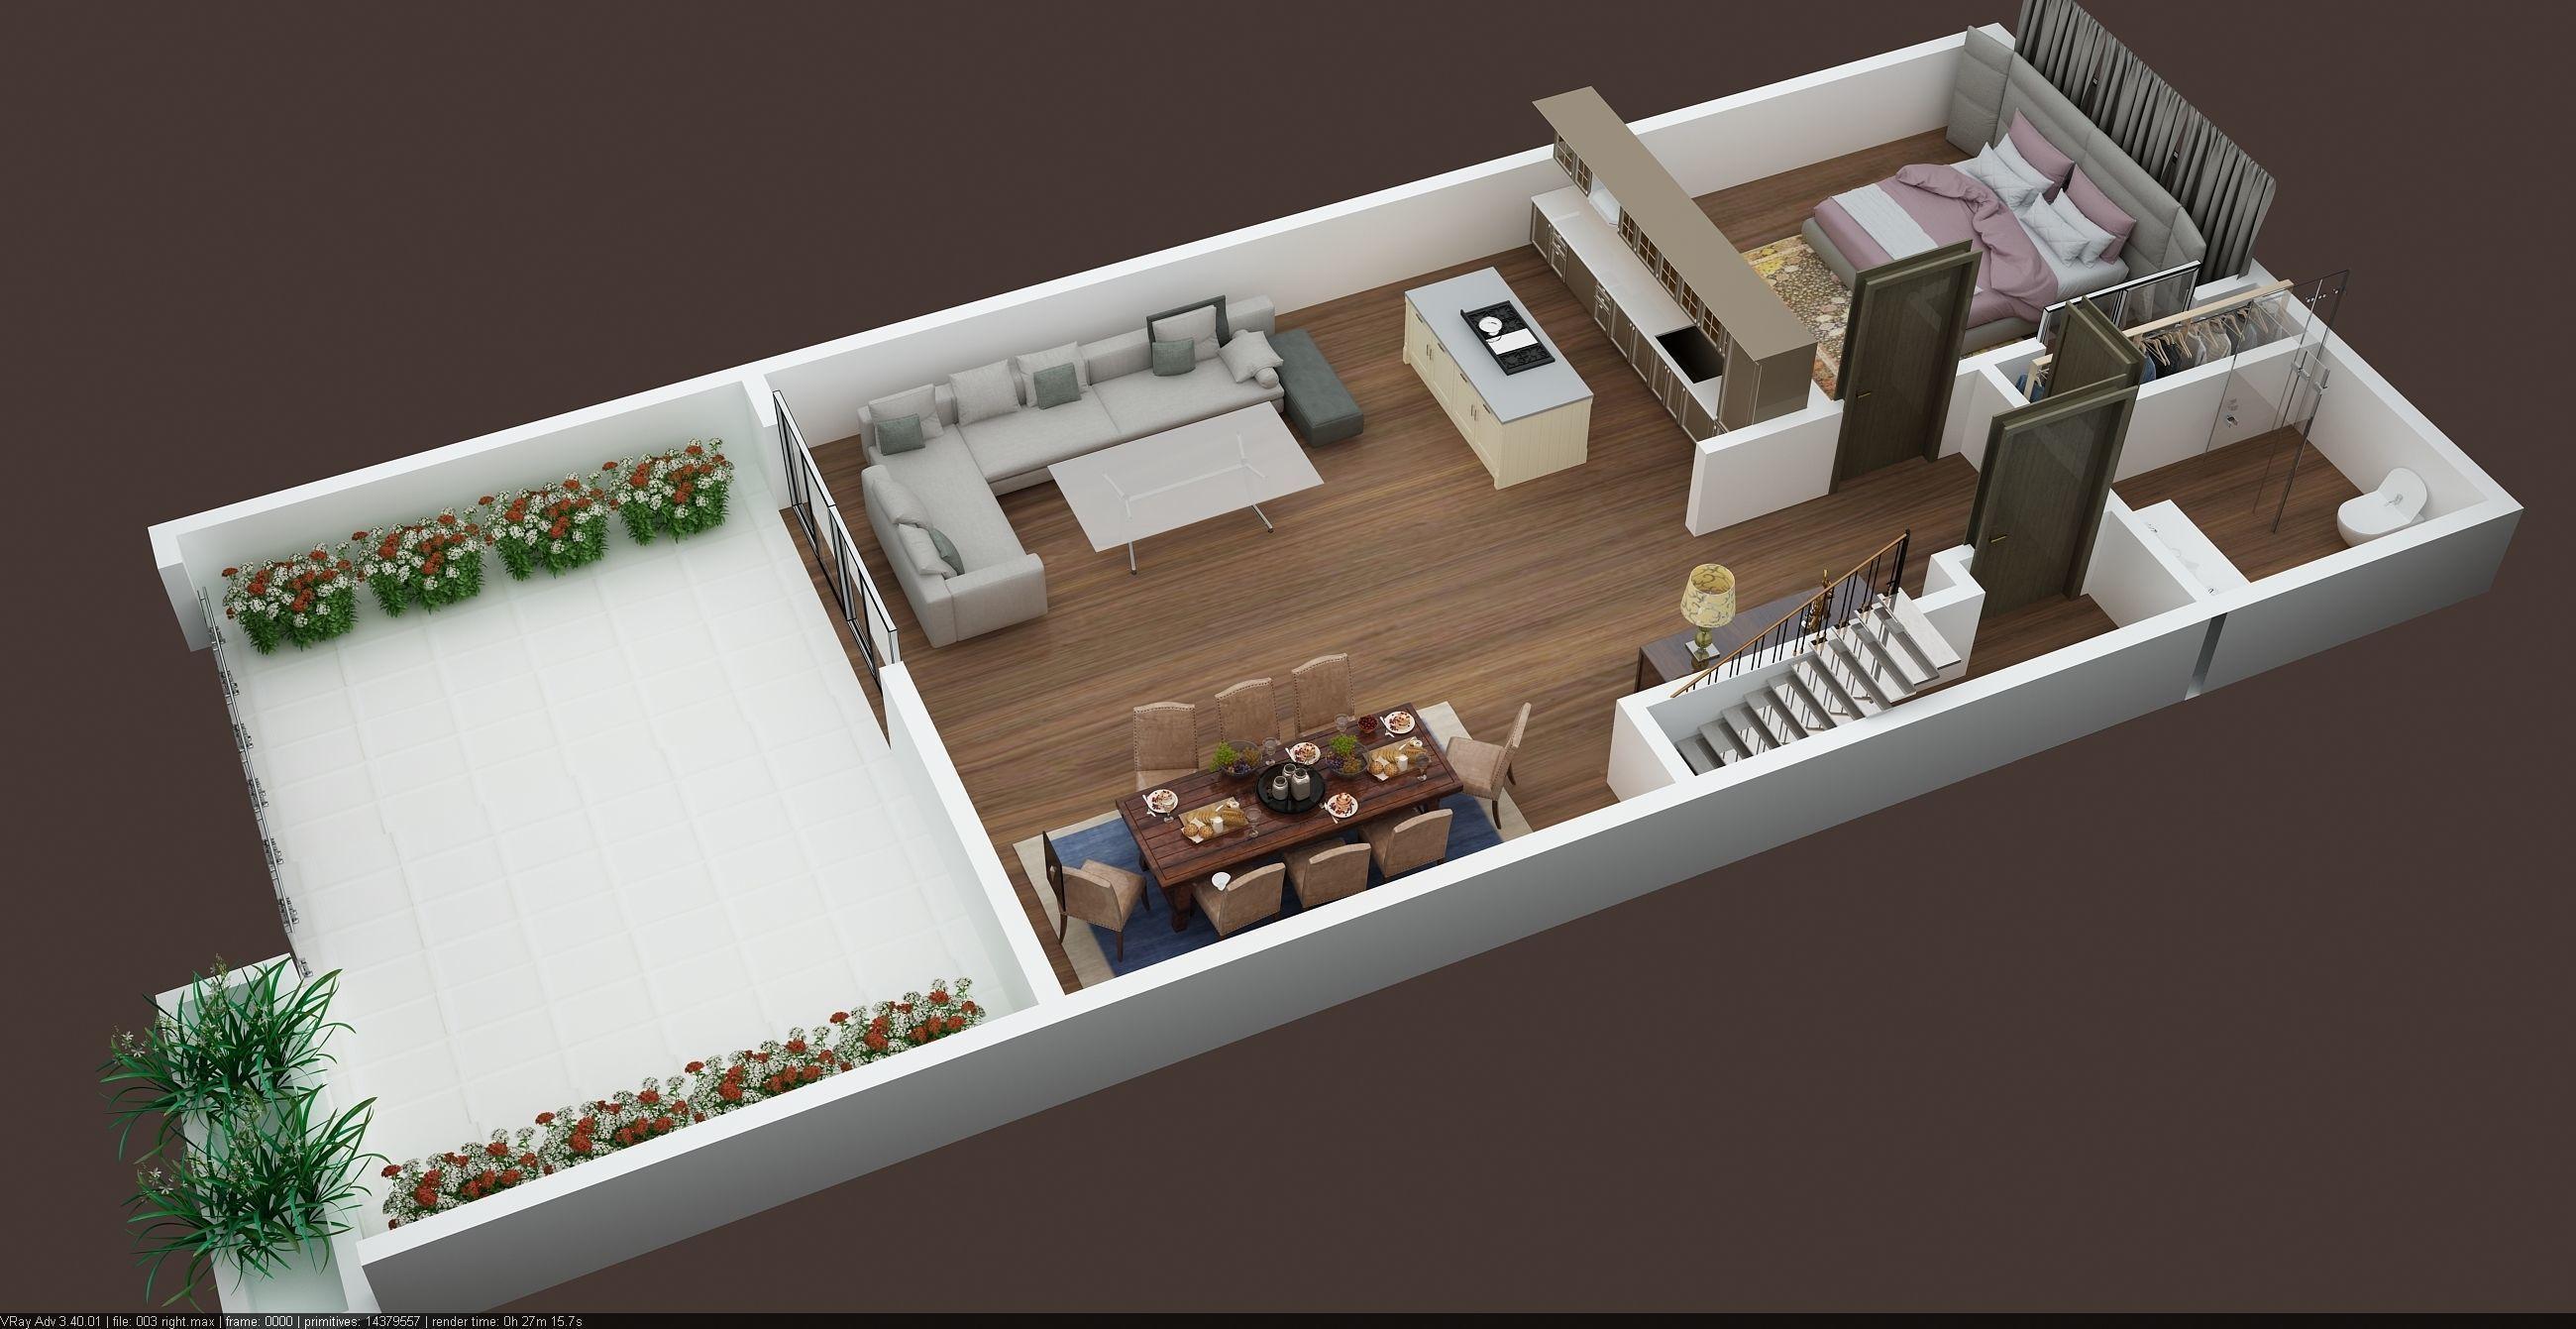 3d floor plans of appartment building all floors